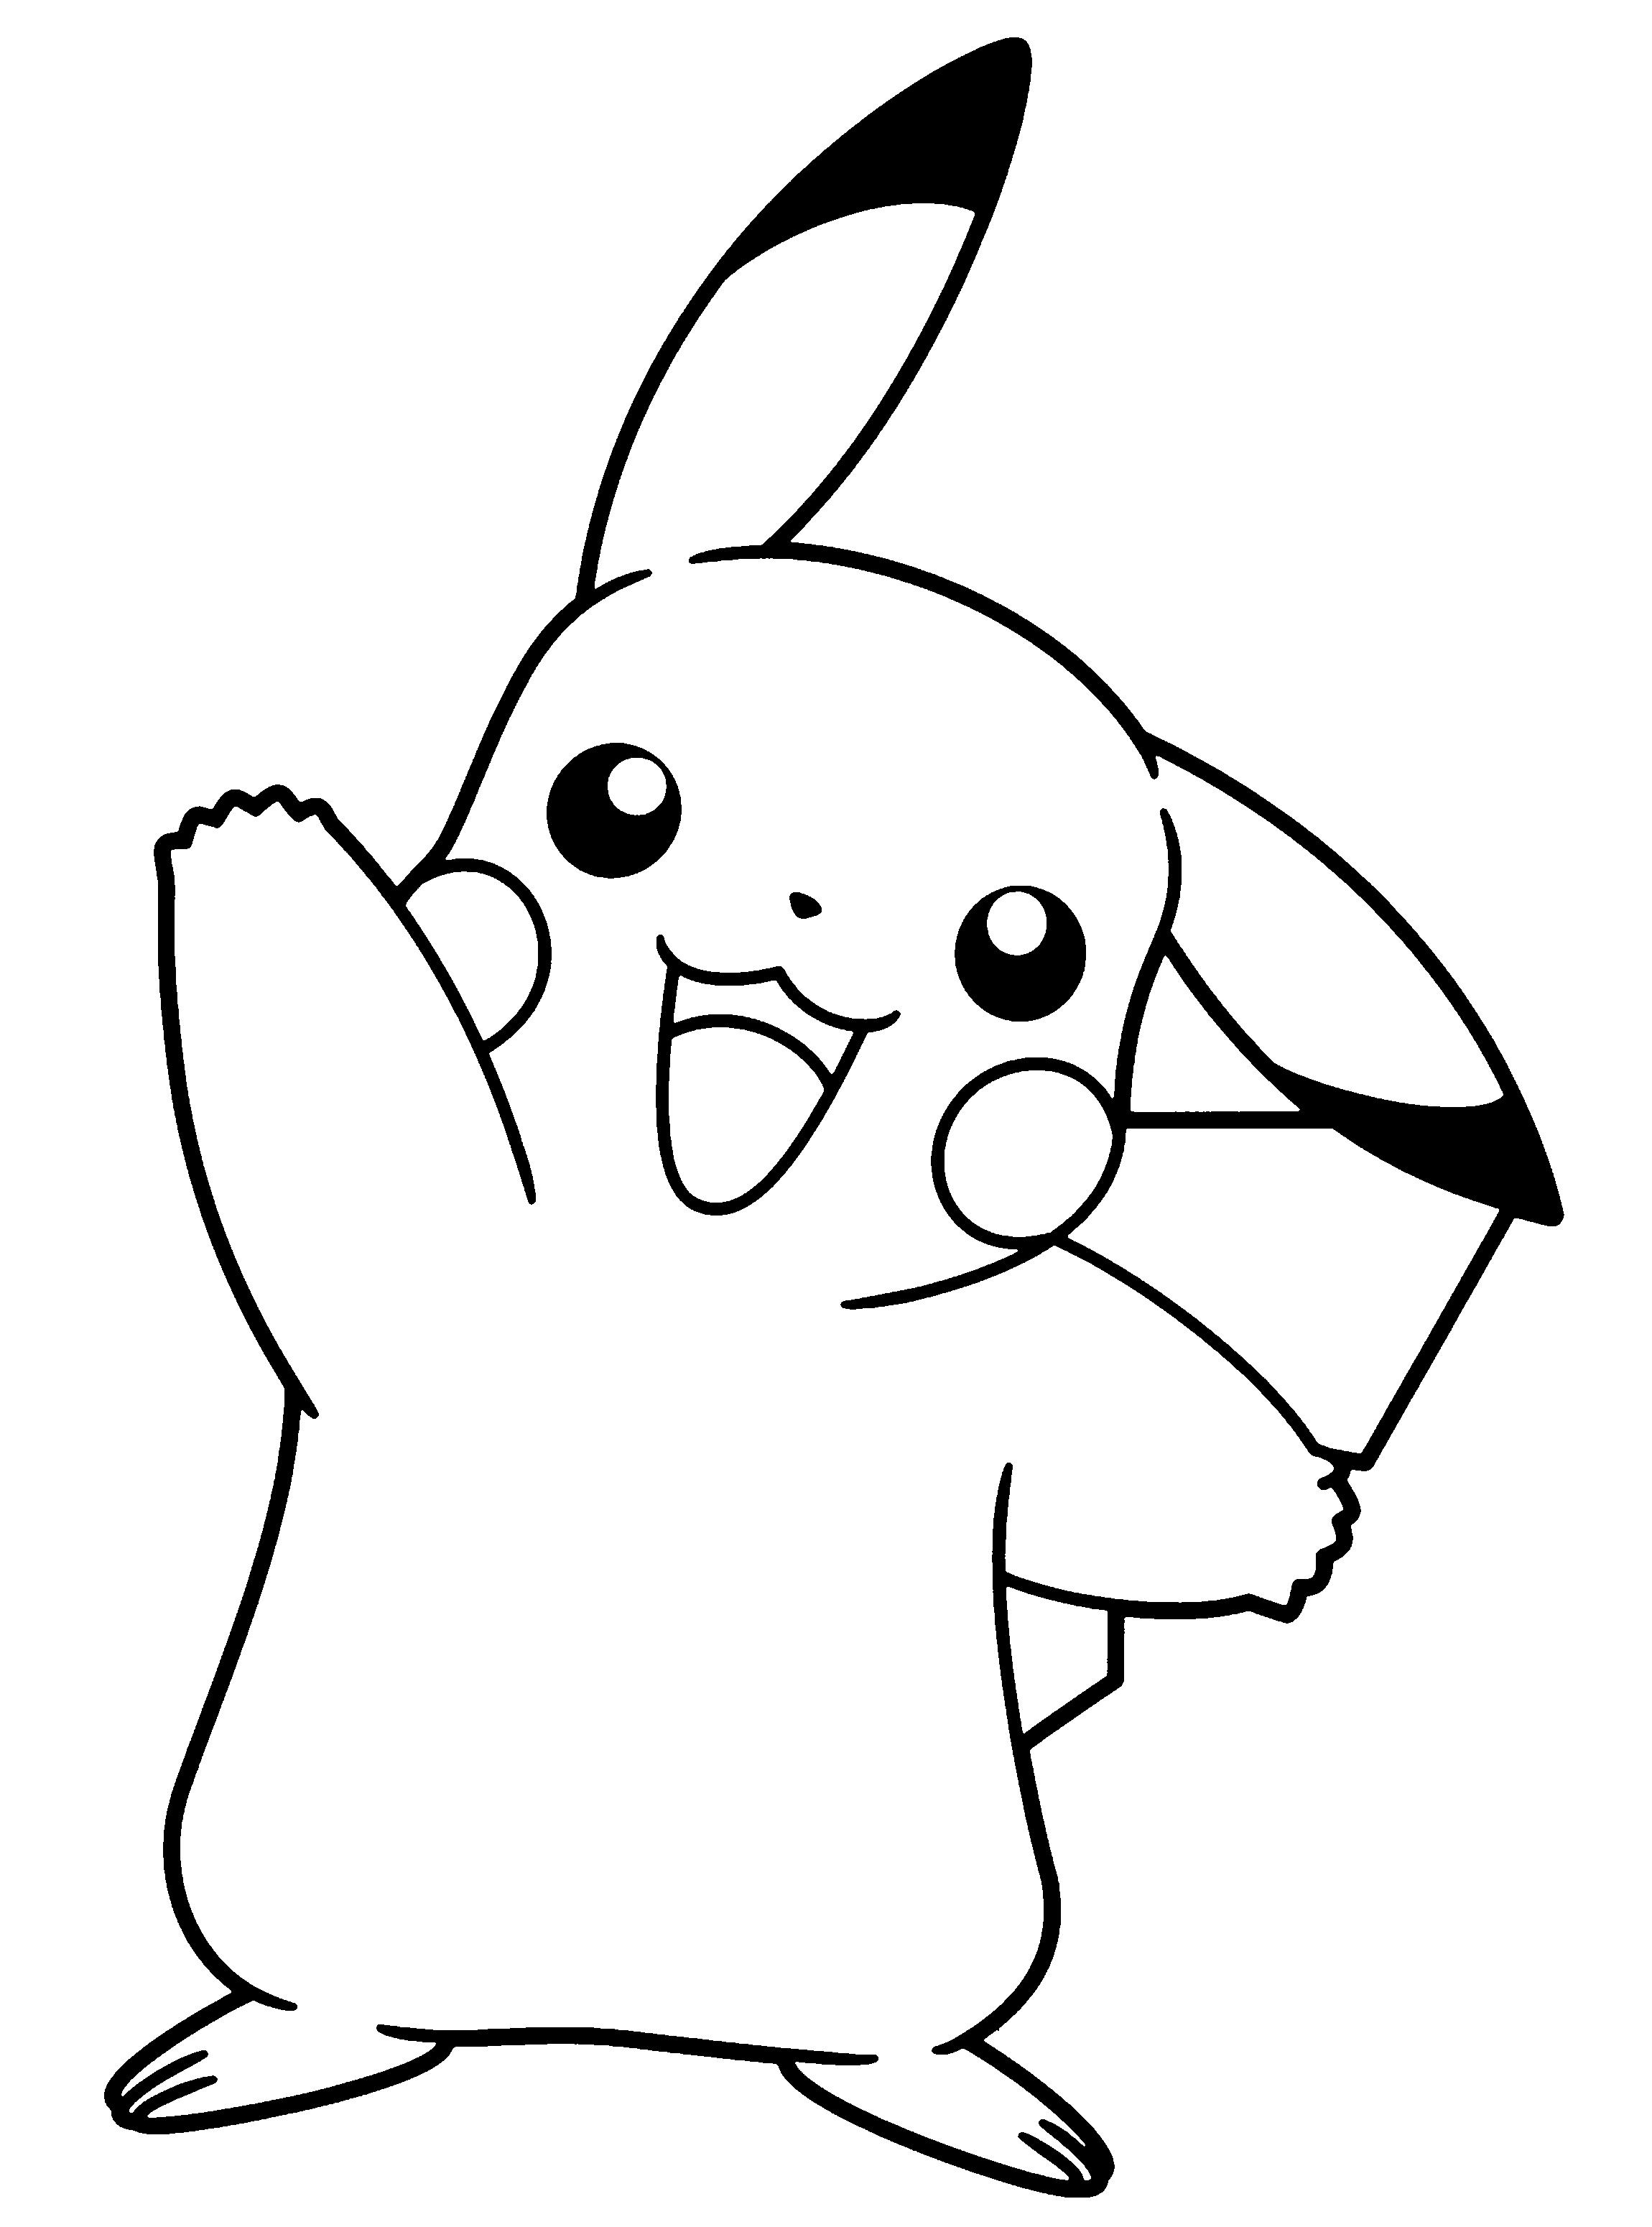 malvorlage  pokemon black ausmalbilder taxzw